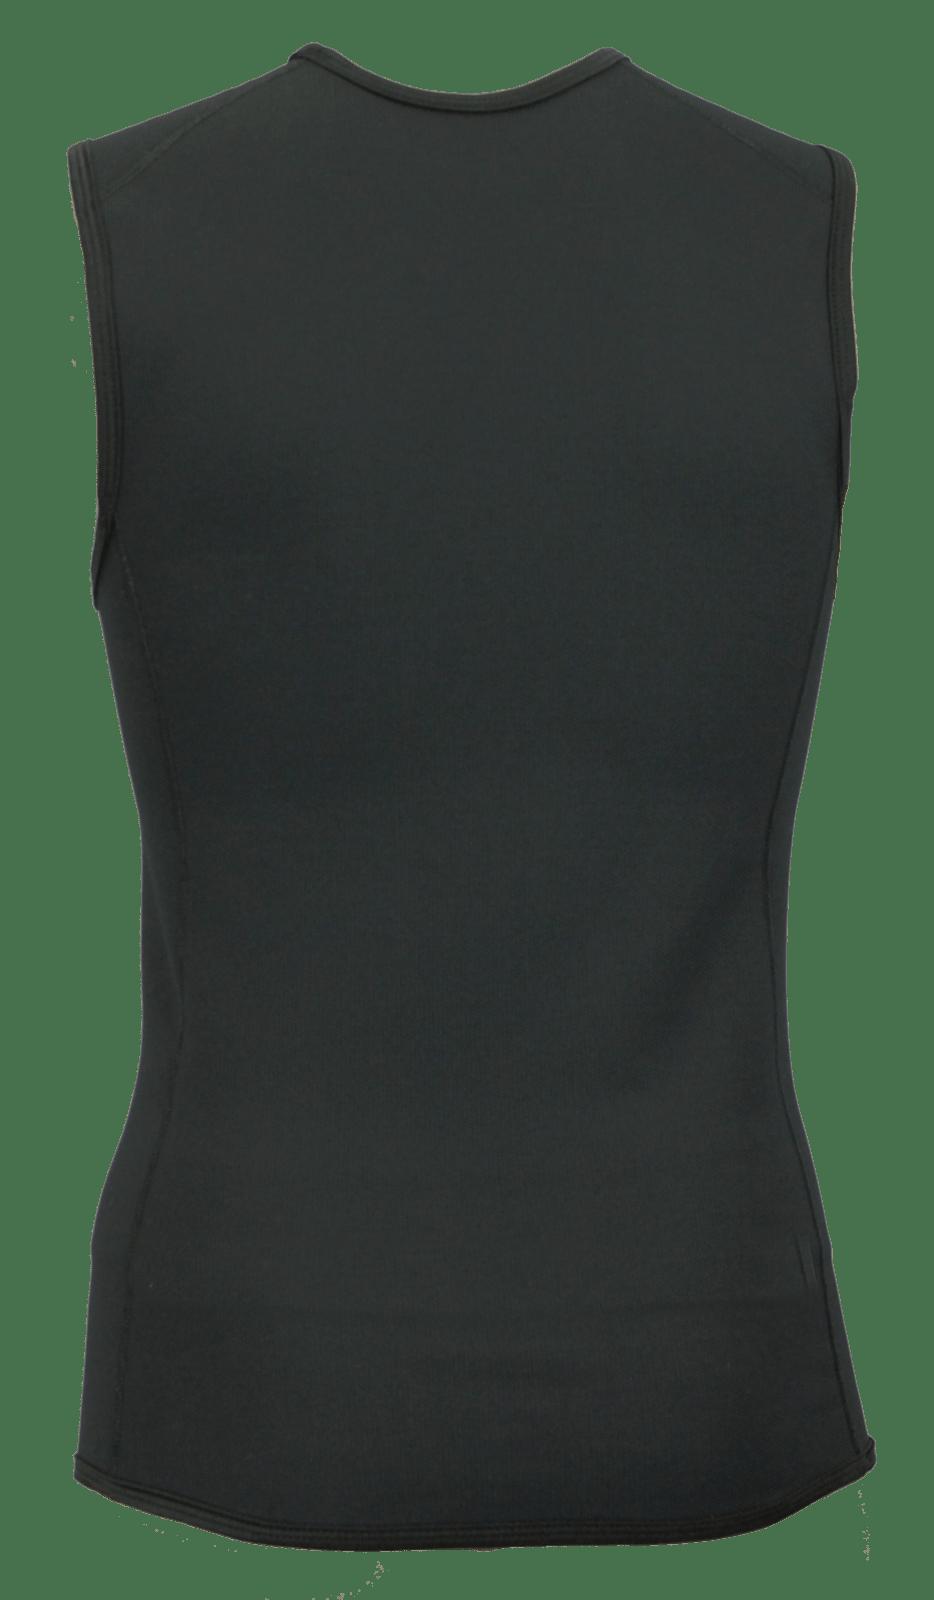 Sharkskin Chillproof Mens Titanium Vest Back